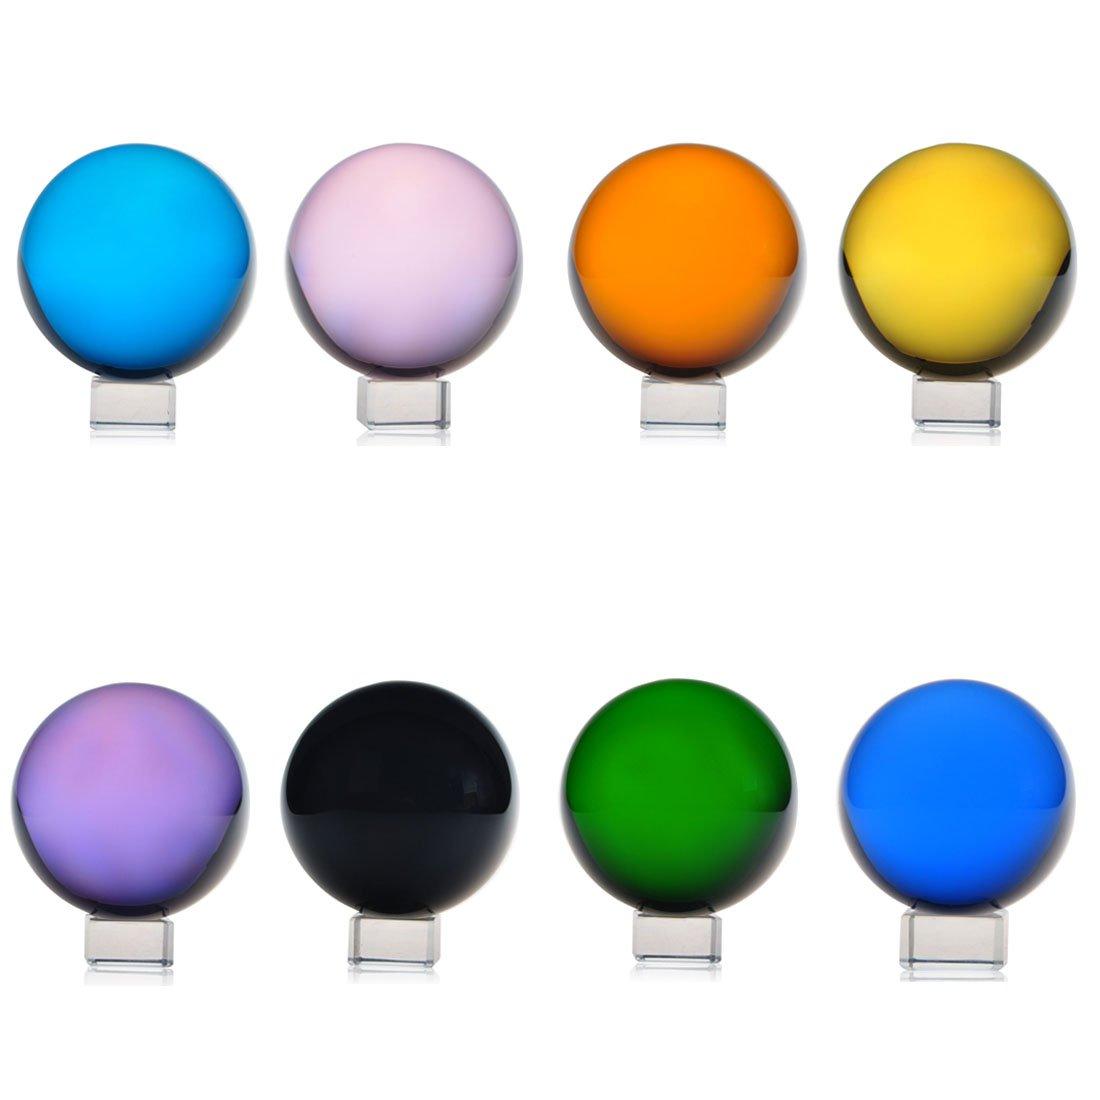 H&d Crystal Meditation Ball Globe 8pcs Free Stand